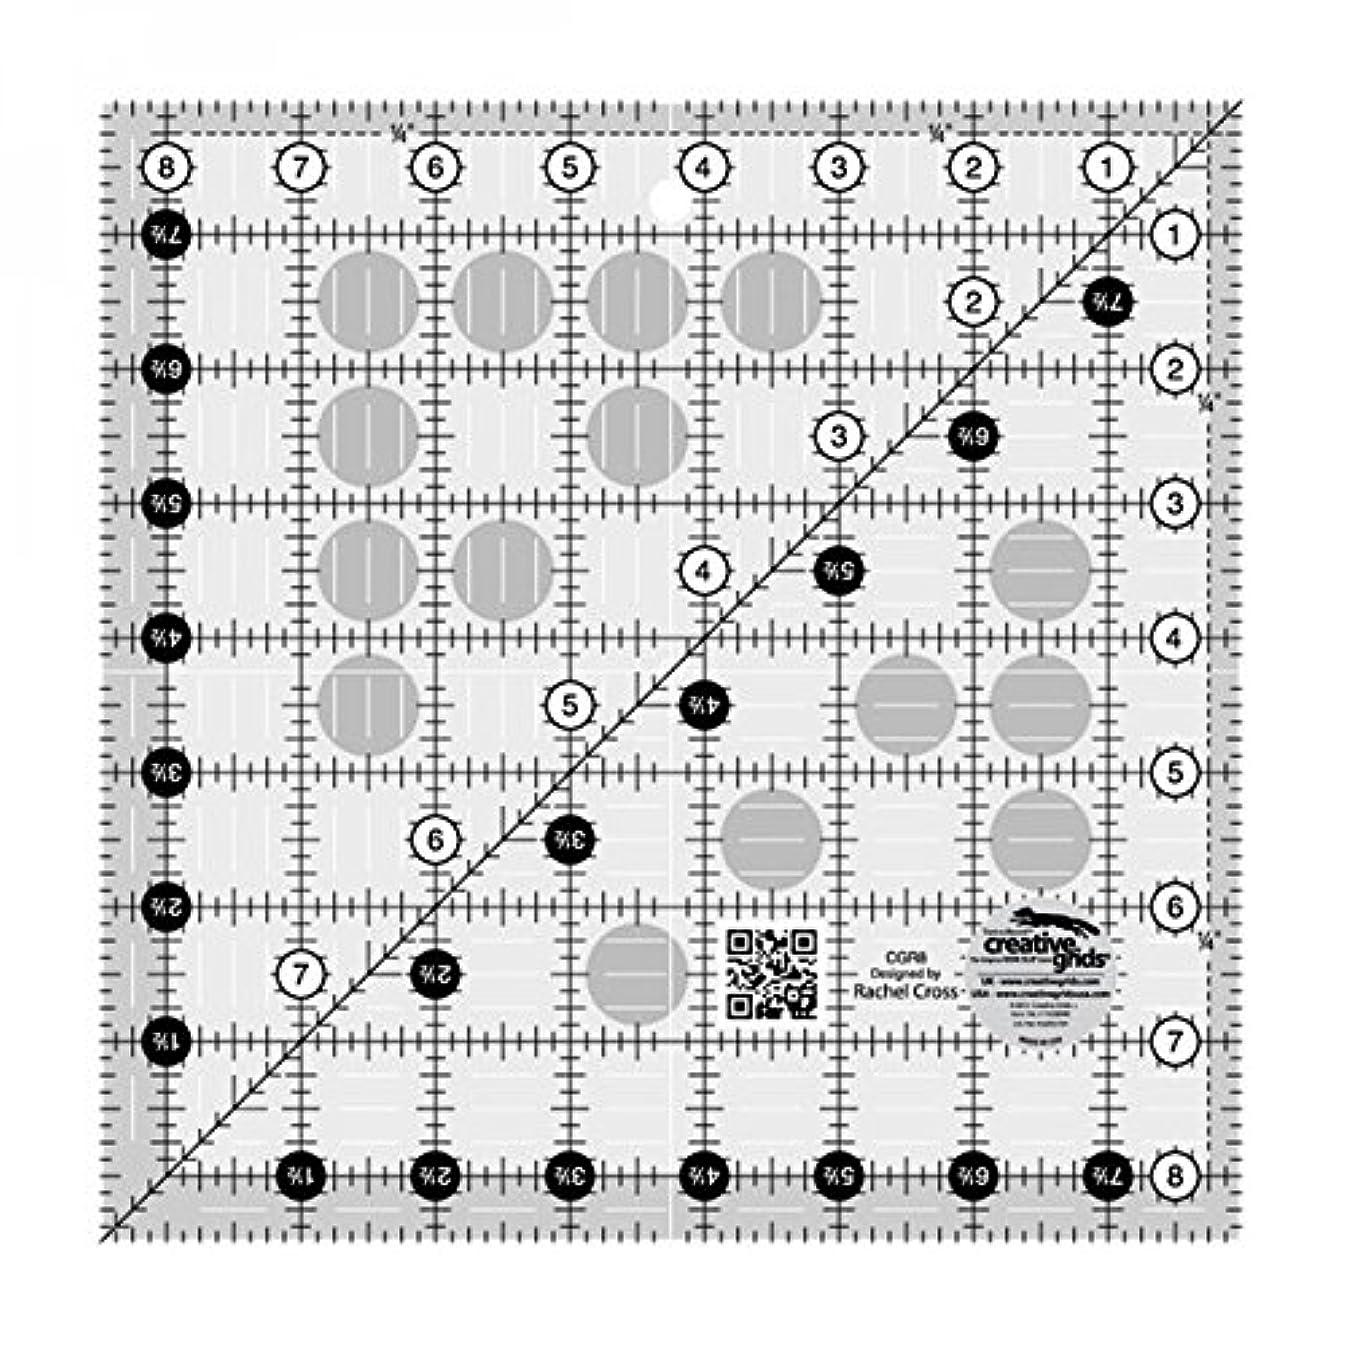 Creative Grids 8.5